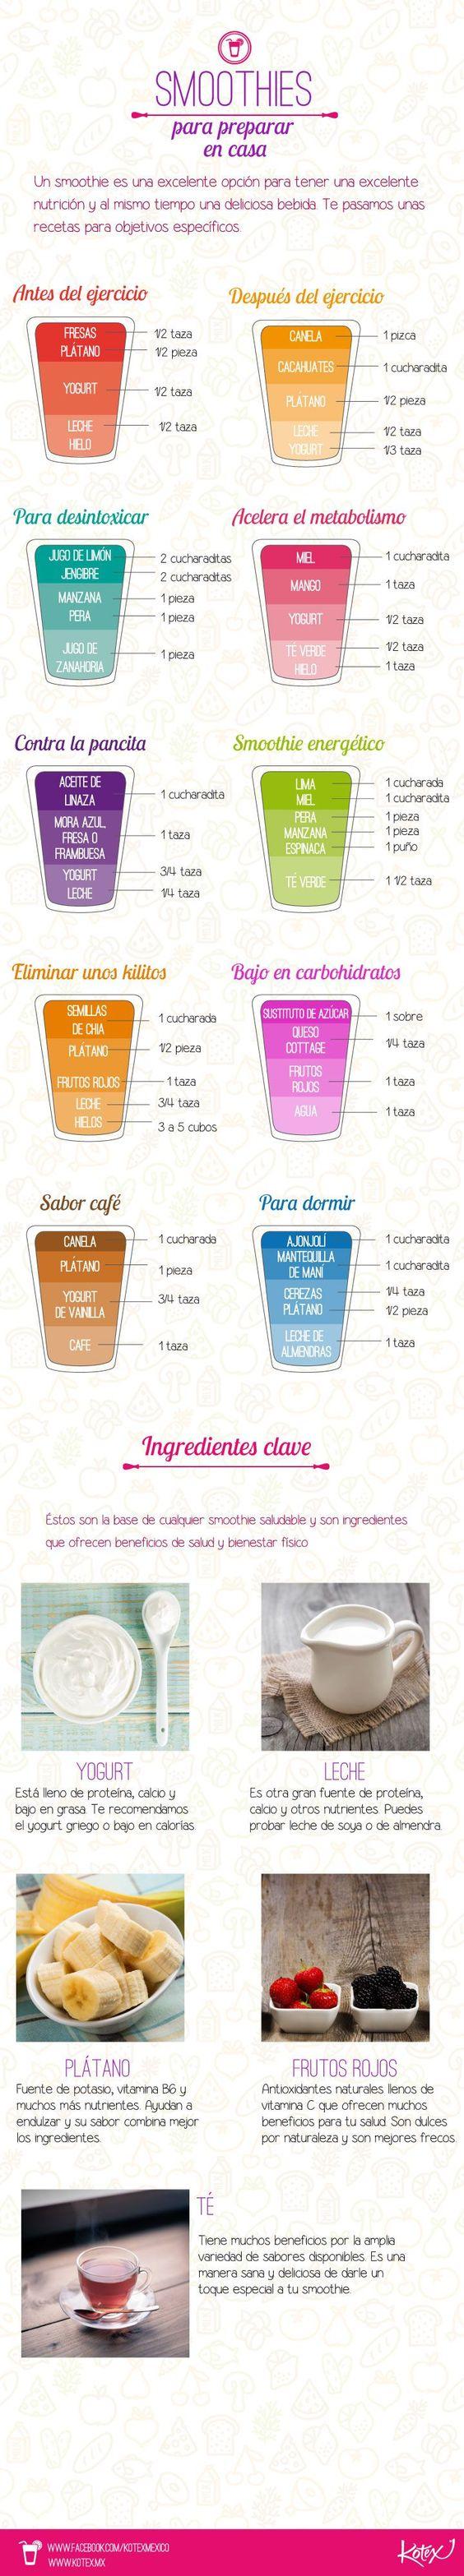 #salud #dieta #alegria  http://www.gorditosenlucha.com/